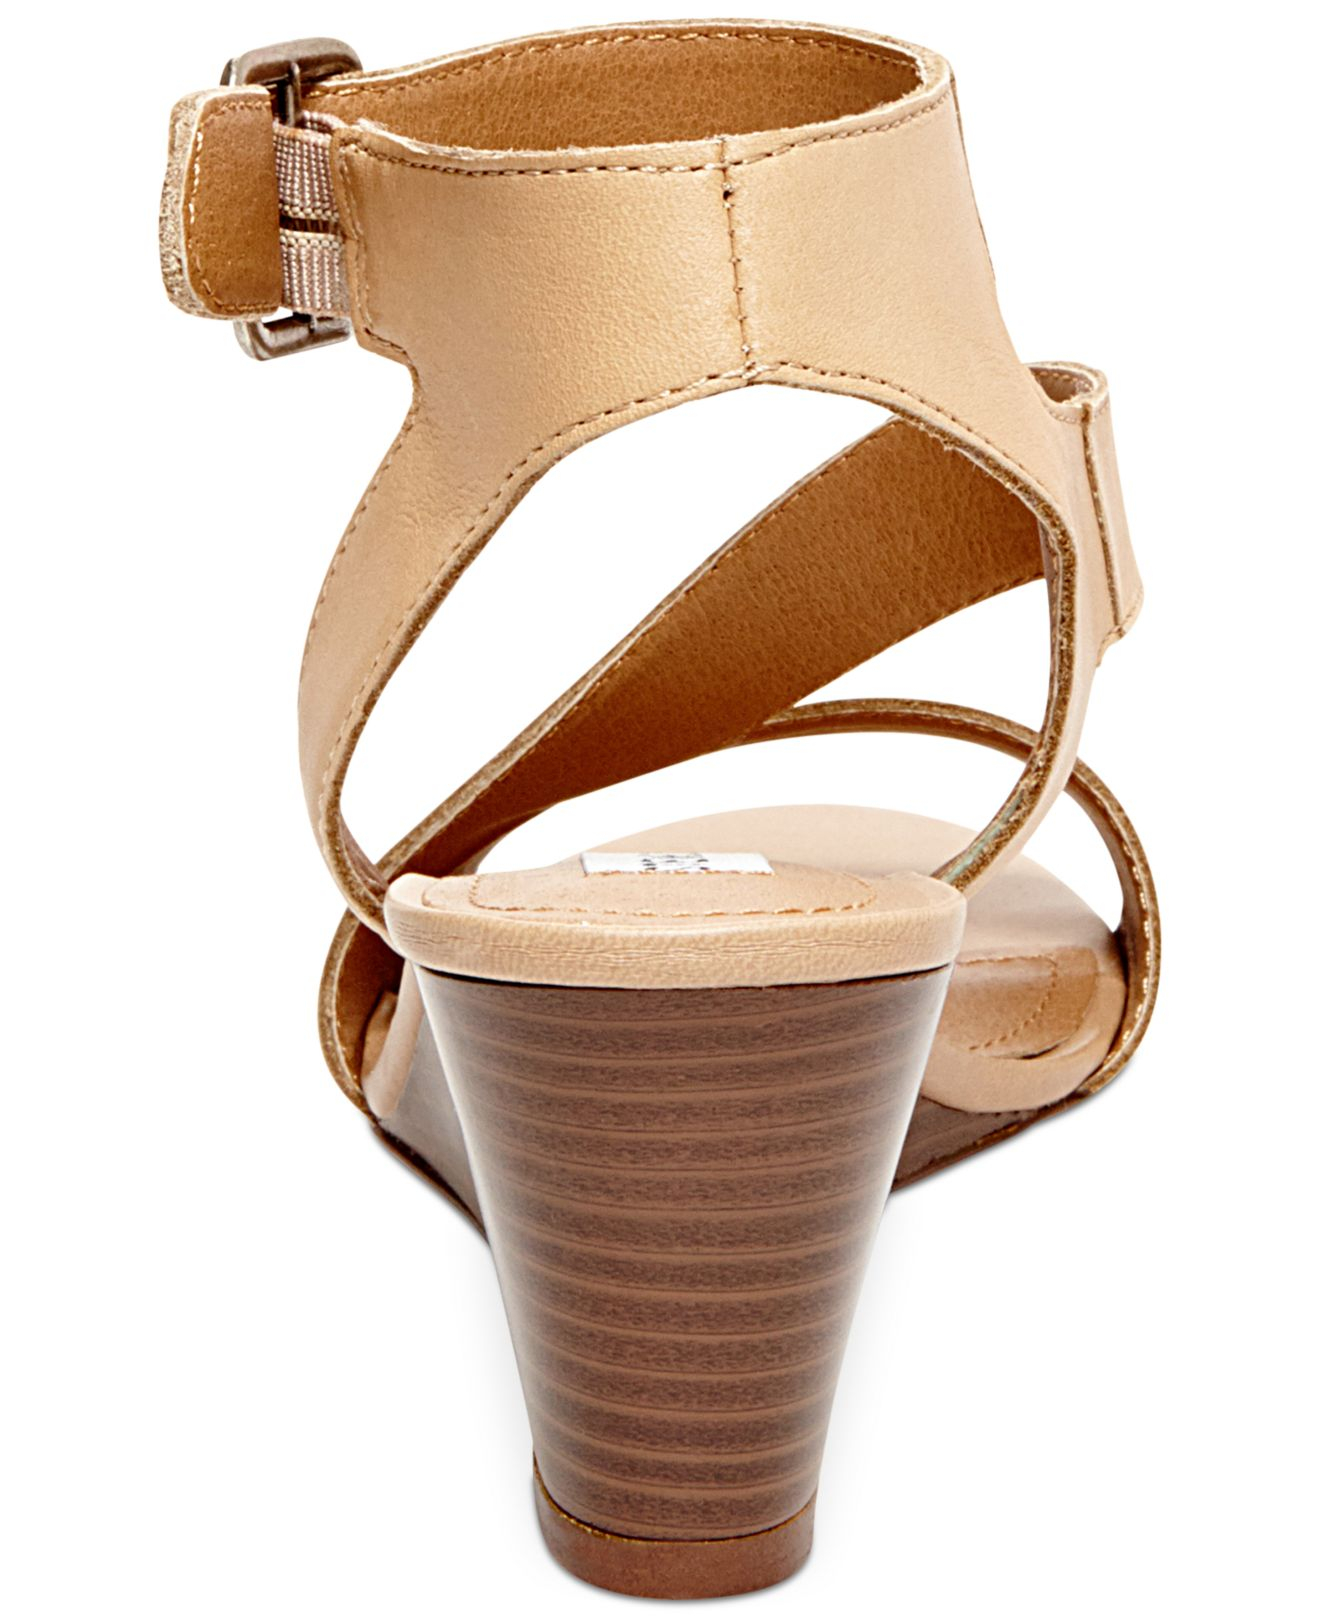 731560d51939 Lyst - Steve Madden Women S Stipend Wedge Sandals in Natural